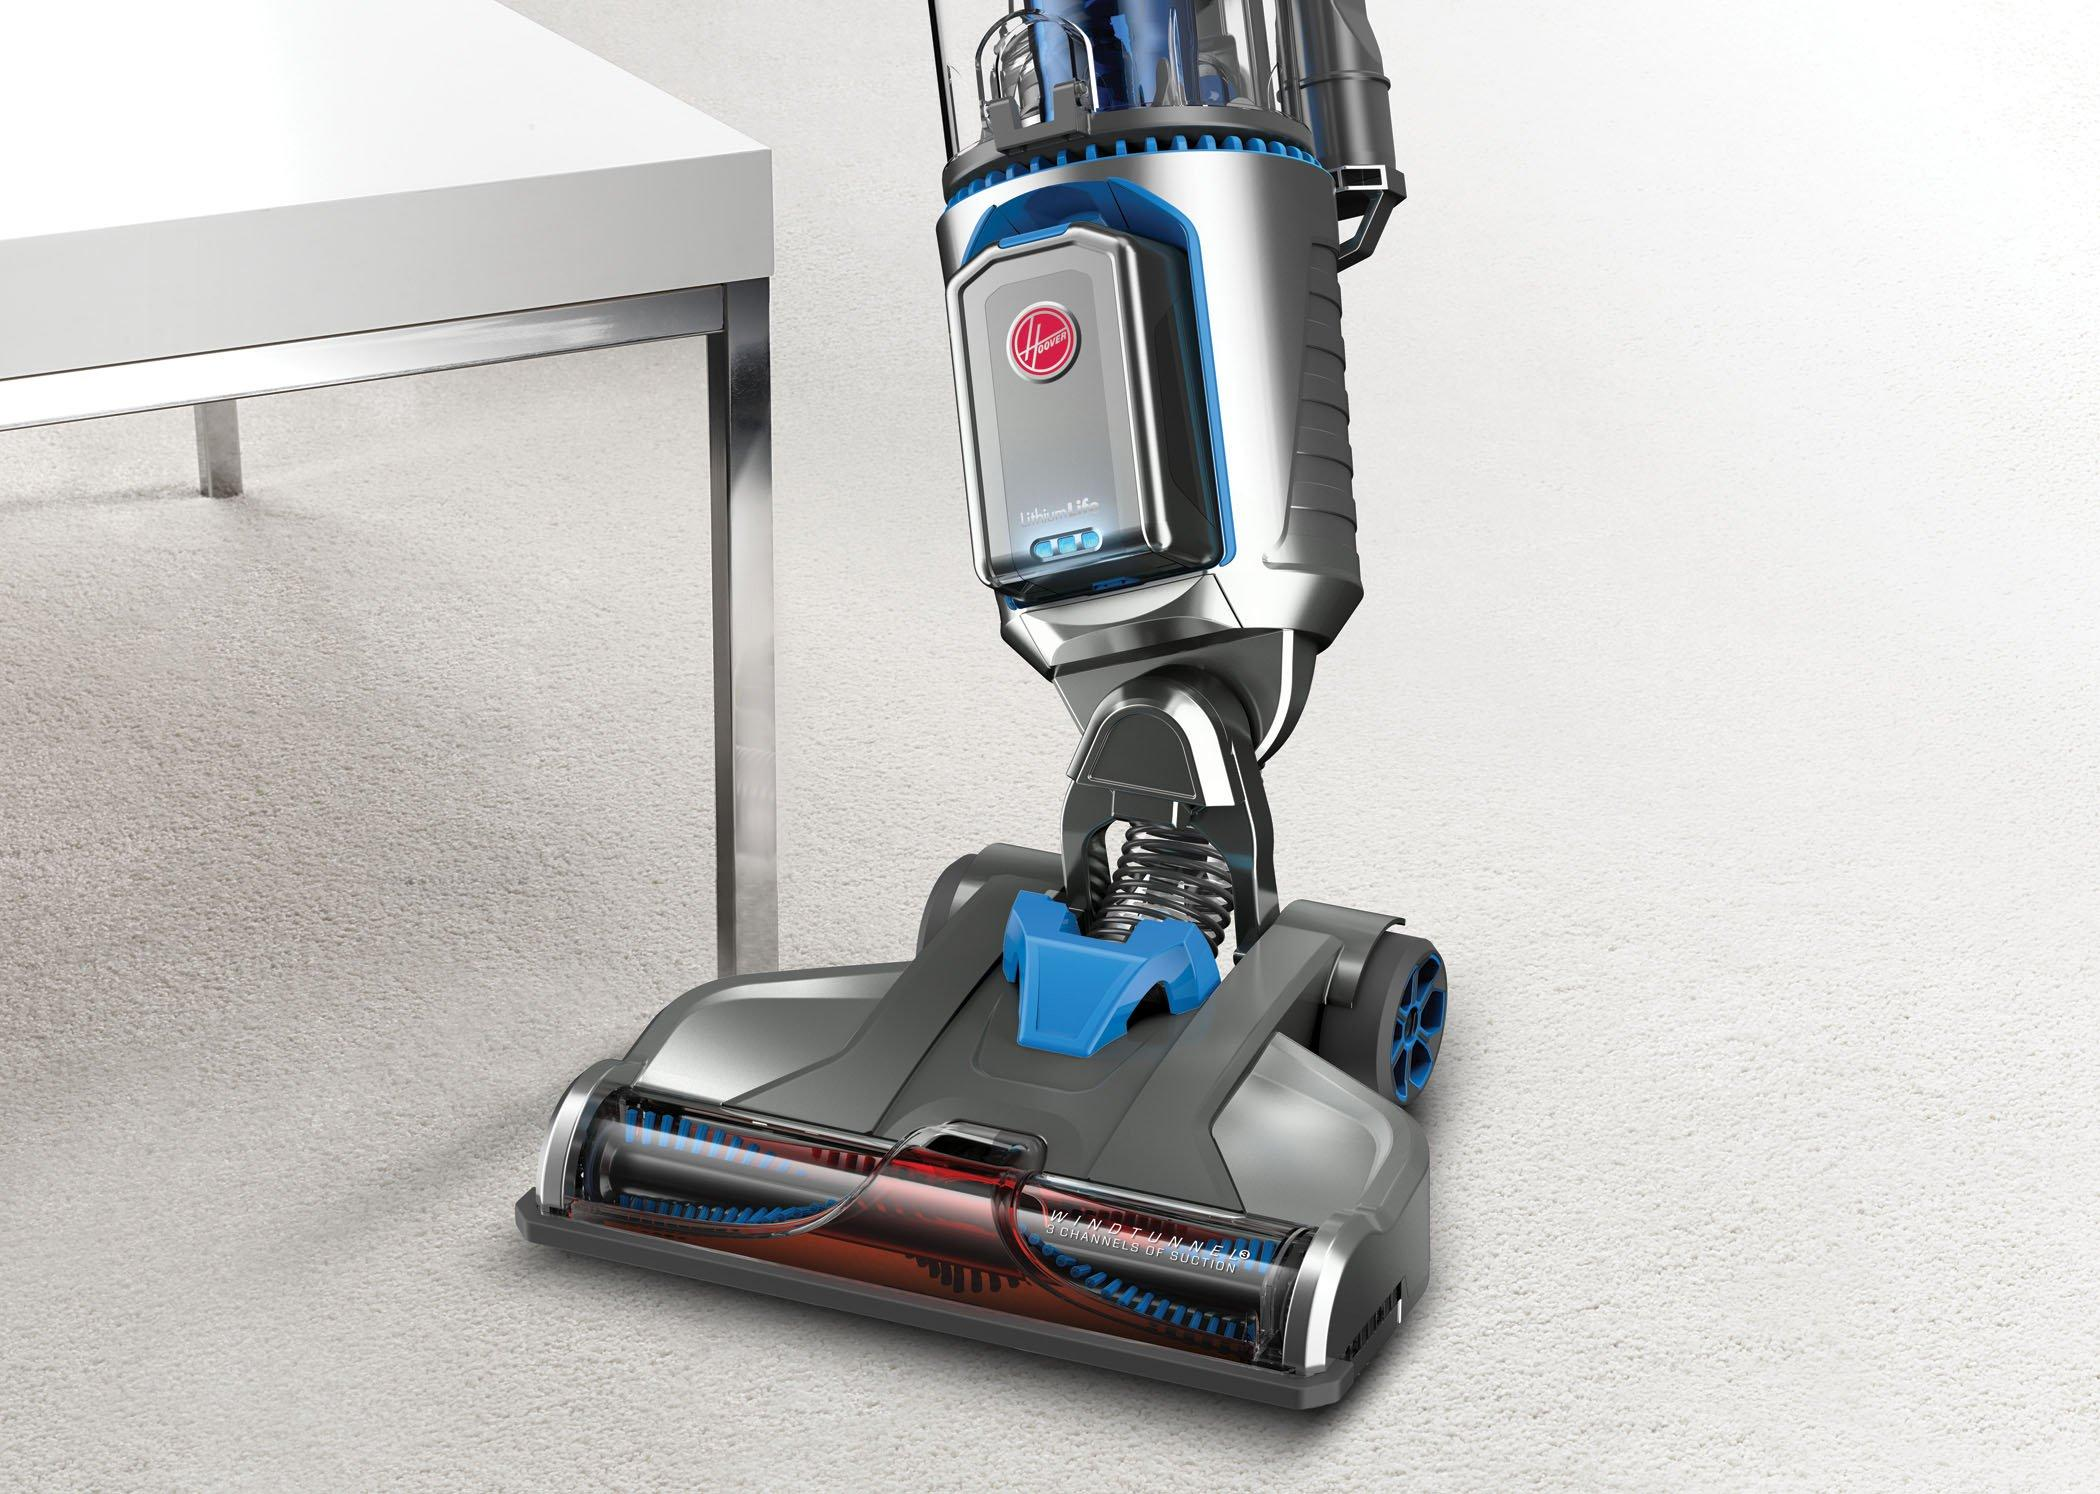 Air Cordless Deluxe Upright Vacuum with Bonus Tools4